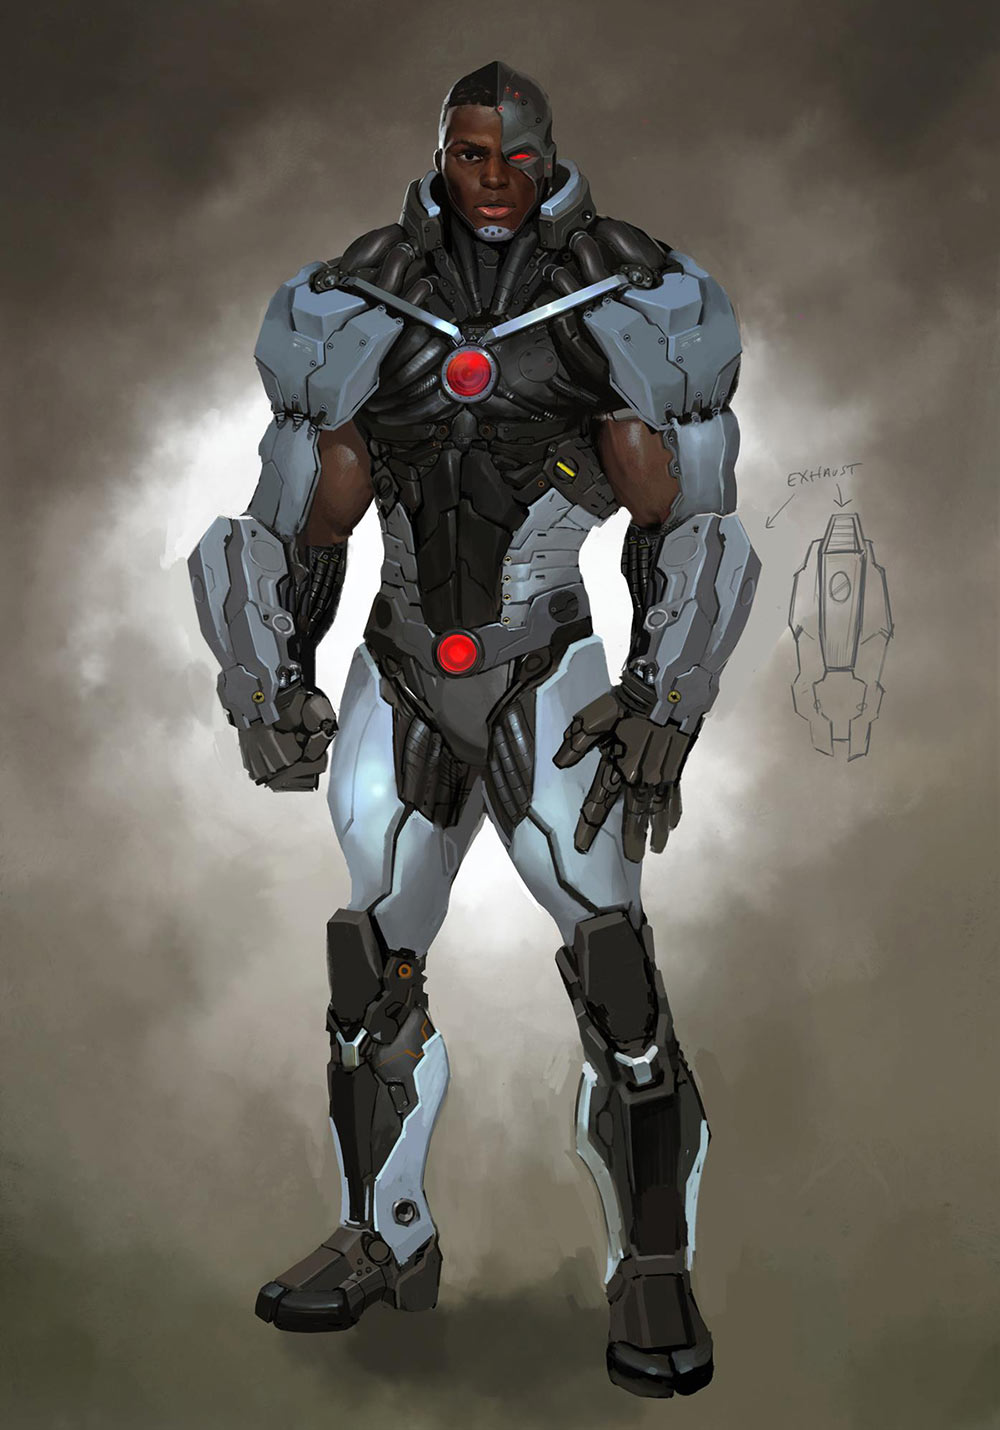 Cyborg HD wallpapers, Desktop wallpaper - most viewed